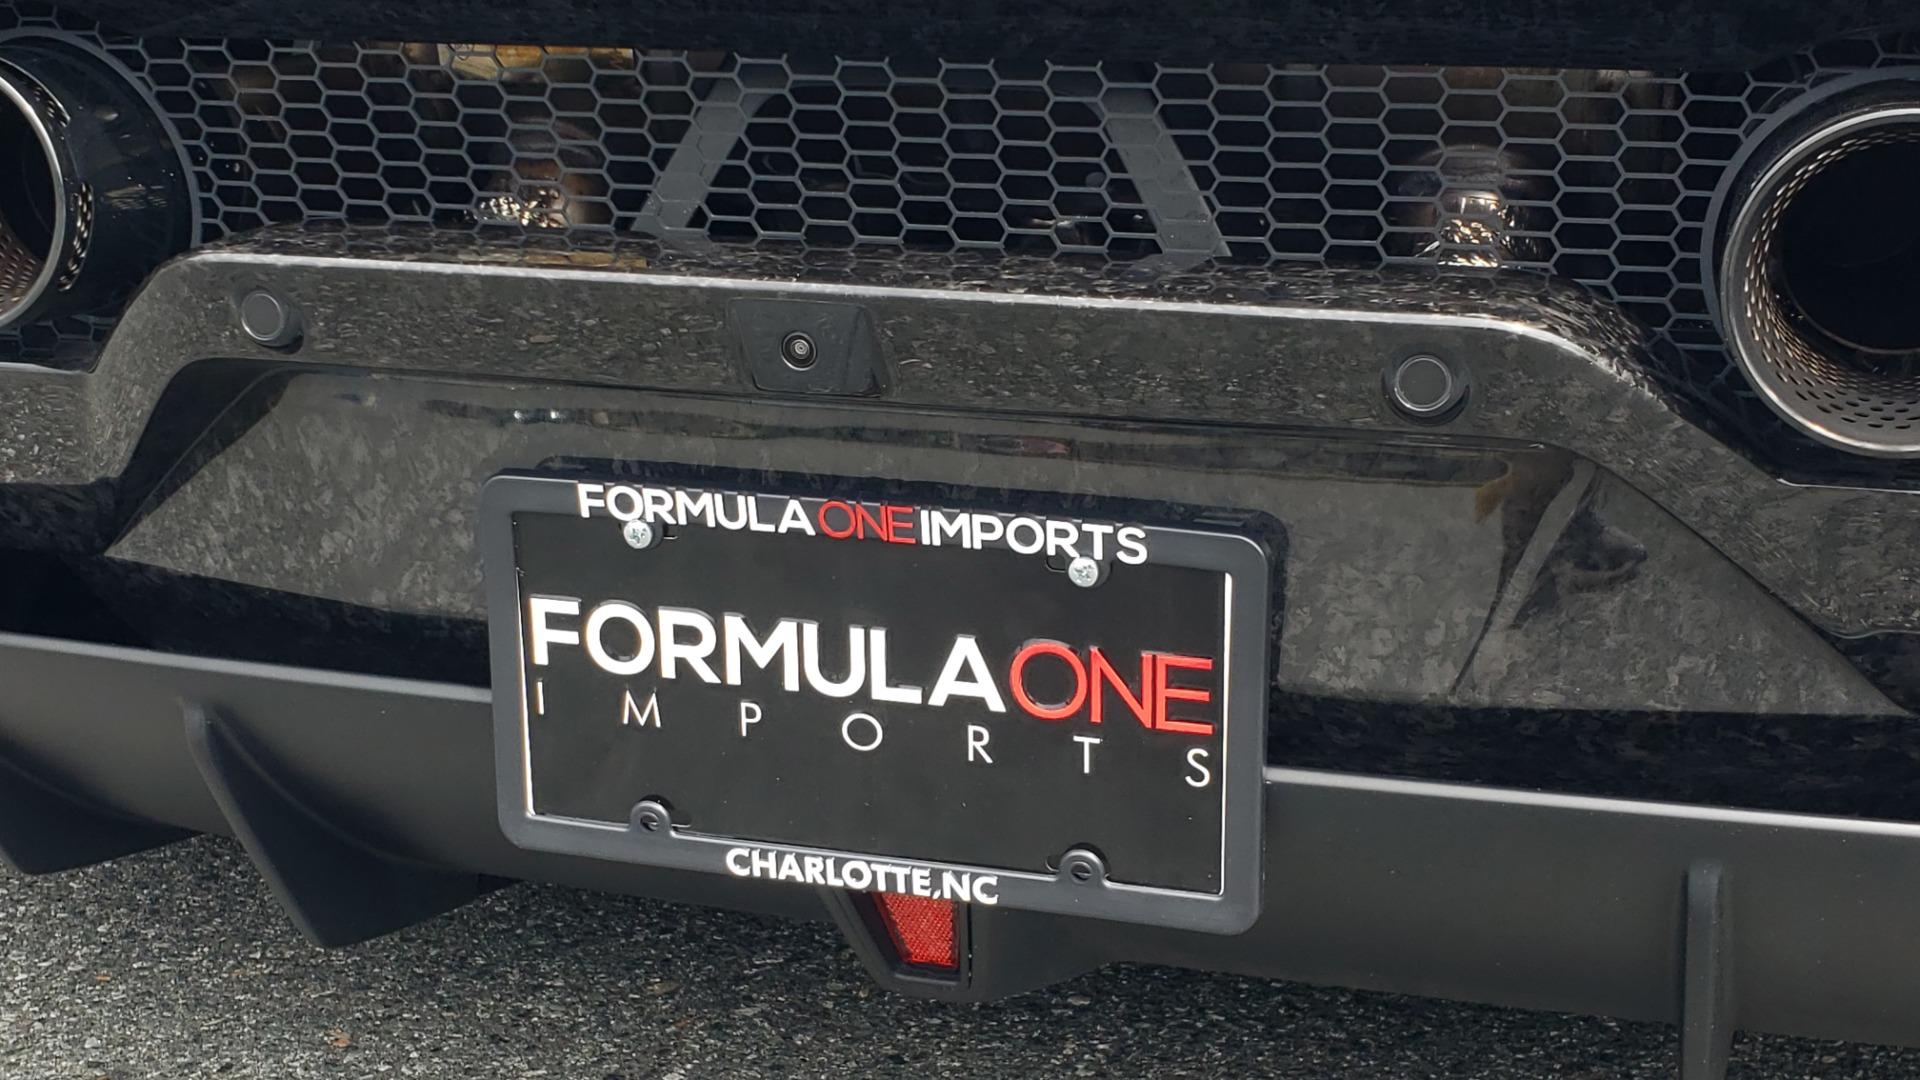 Used 2018 Lamborghini HURACAN PERFORMANTE 5.2L V10 / 630HP / 7-SPD AUTO / AWD / NAV / PREM SND for sale $269,995 at Formula Imports in Charlotte NC 28227 40